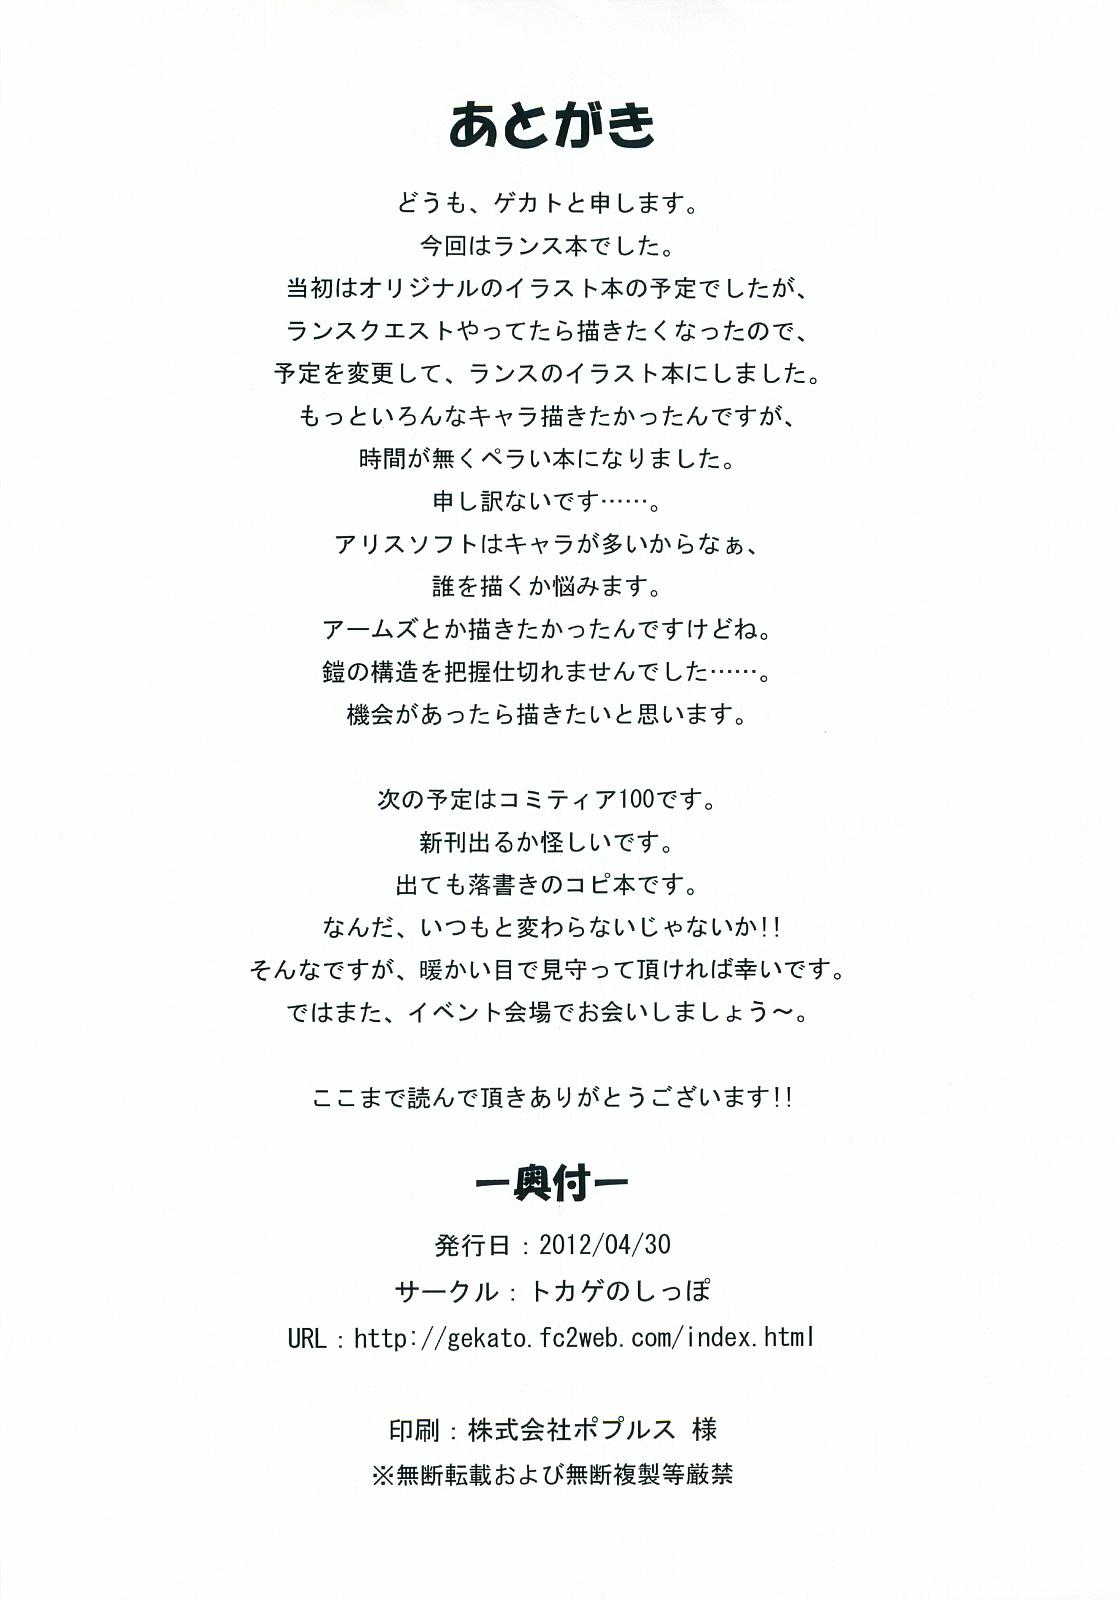 (COMIC1☆6) [Tokage no Shippo (Gekato)] -NARROW INTERESTS- (Rance) 8